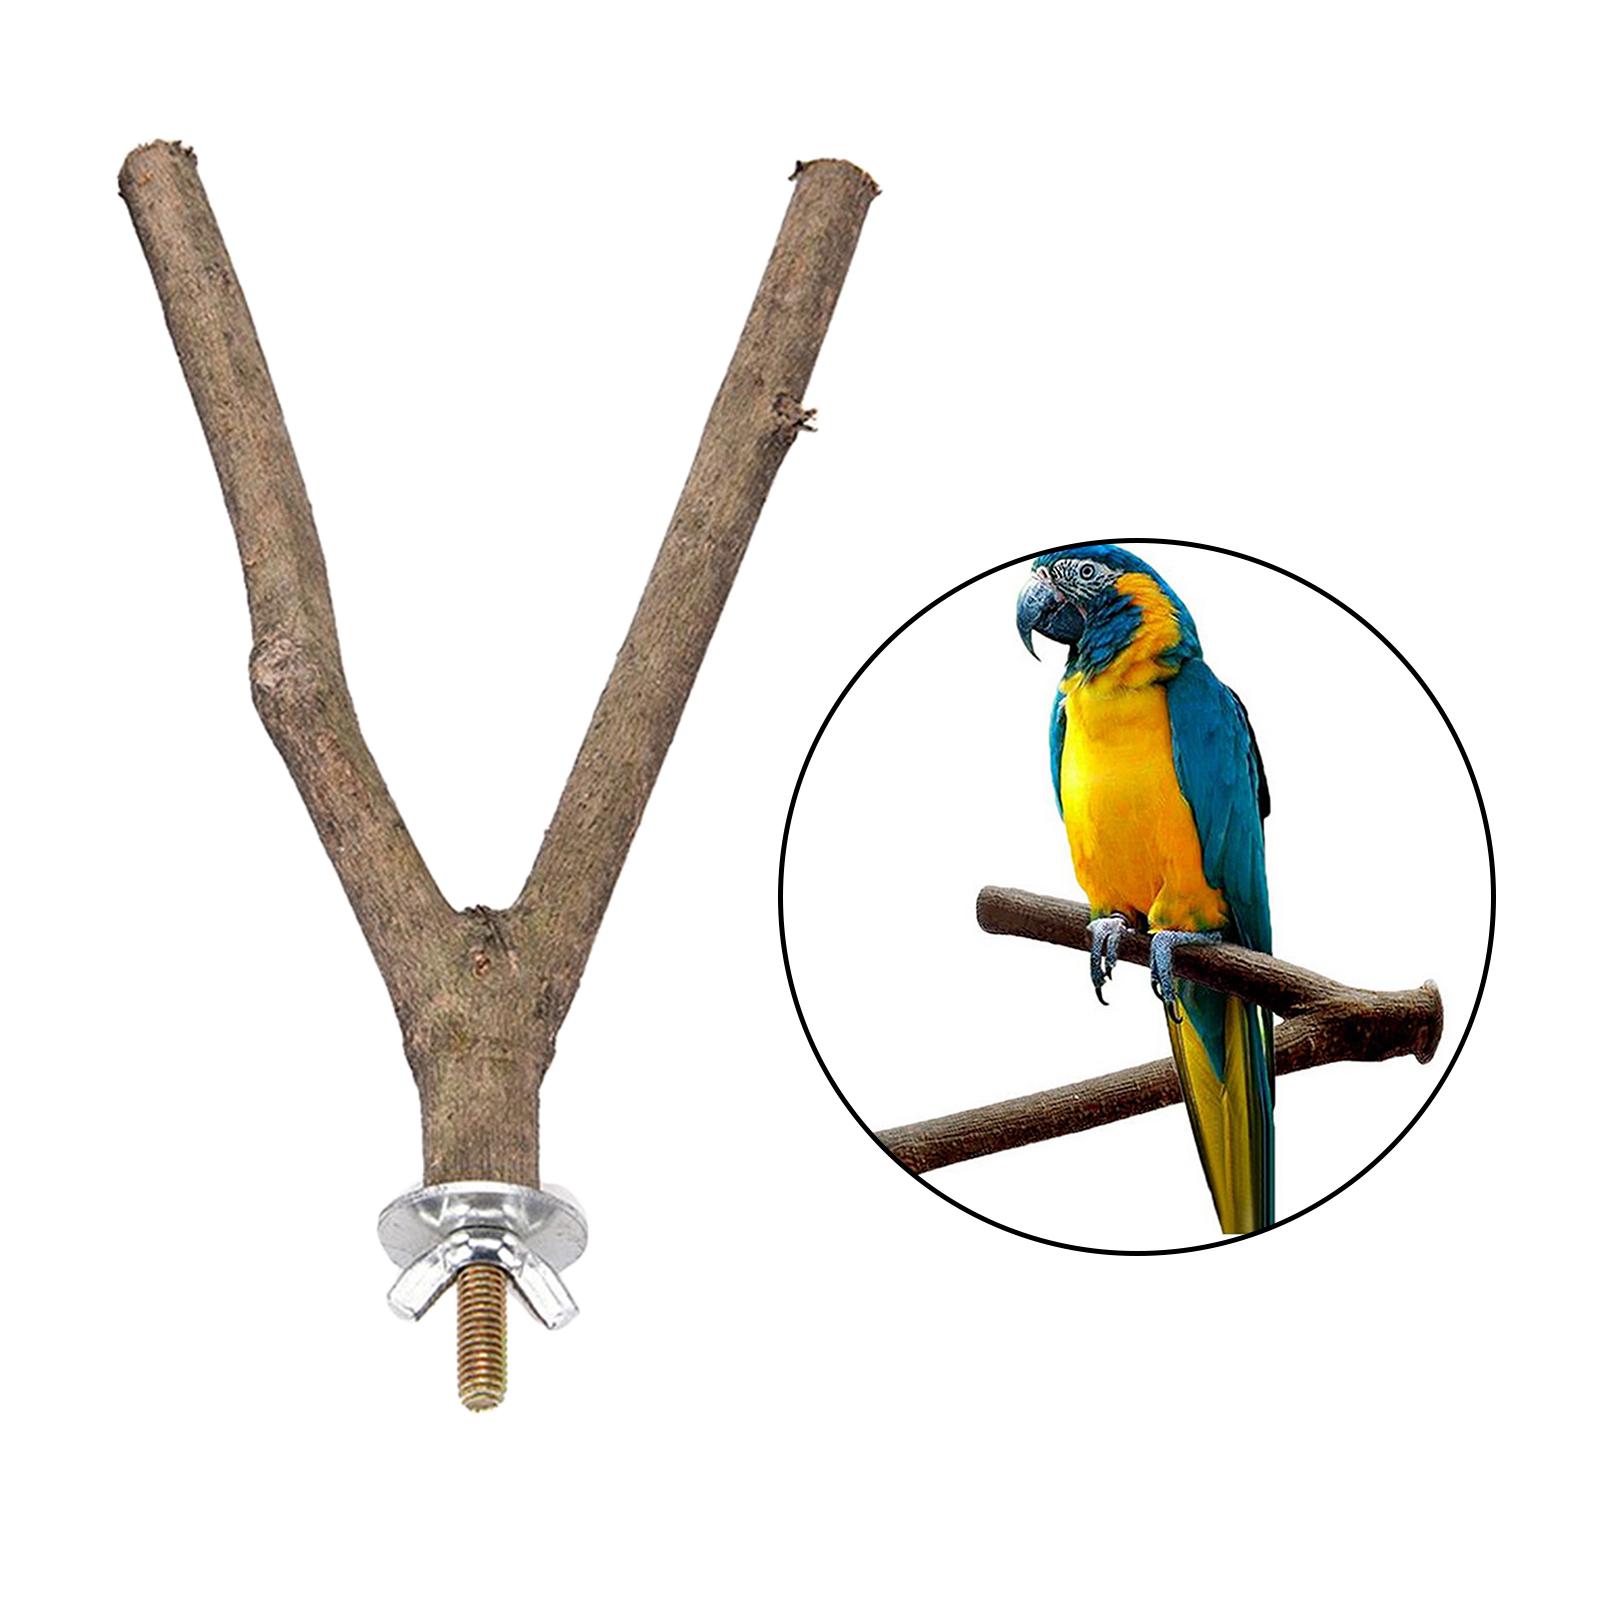 thumbnail 22 - Bird-Perch-Wood-Stand-Bird-Cage-Swing-Branch-for-Parrot-Parakeet-Cockatiel